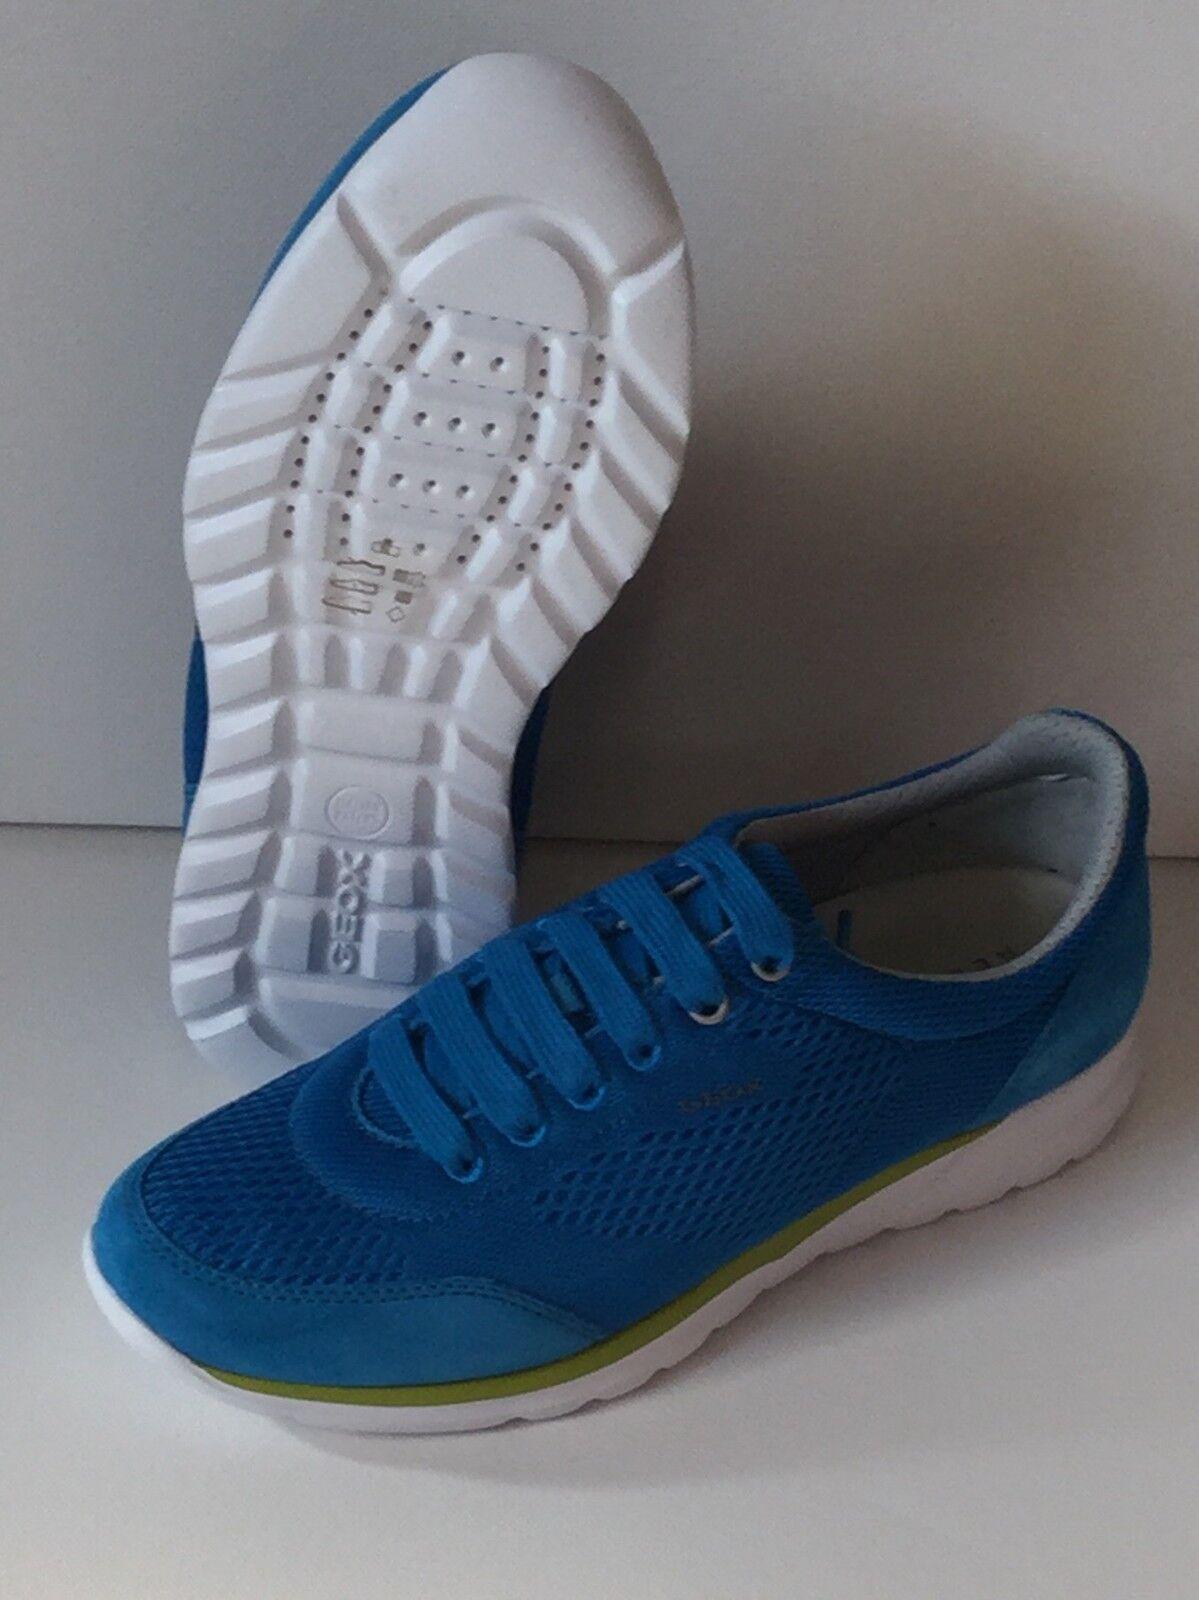 Geox Respira U Damian B  Schuhe Turnschuhe  Leder Sneaker 41 42 43 44 45 46  azu